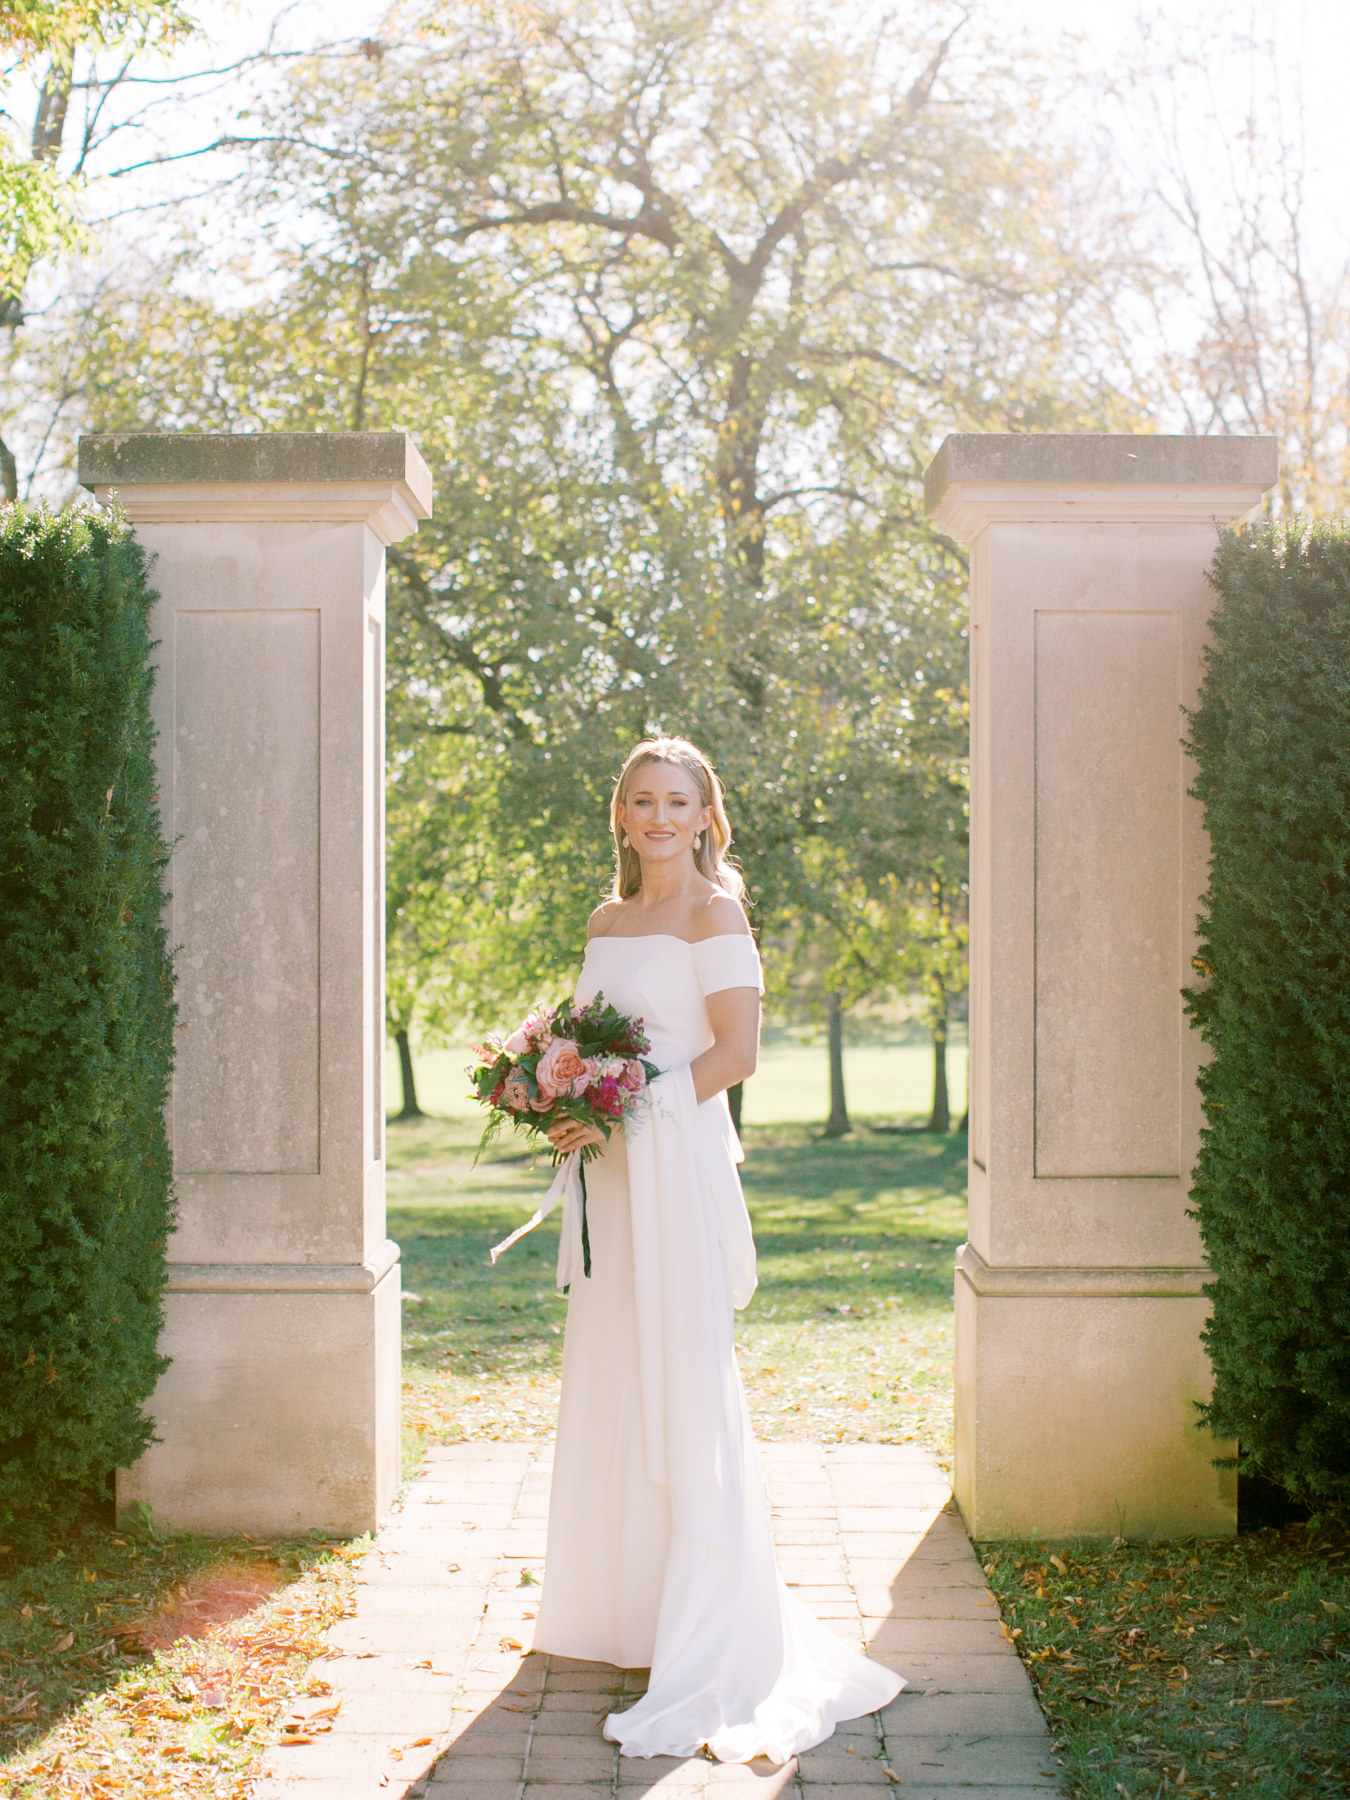 20Great_Marsh_Estates_Wedding_Anne_Kelley_Events_Astrid_PhotographyAP_01765